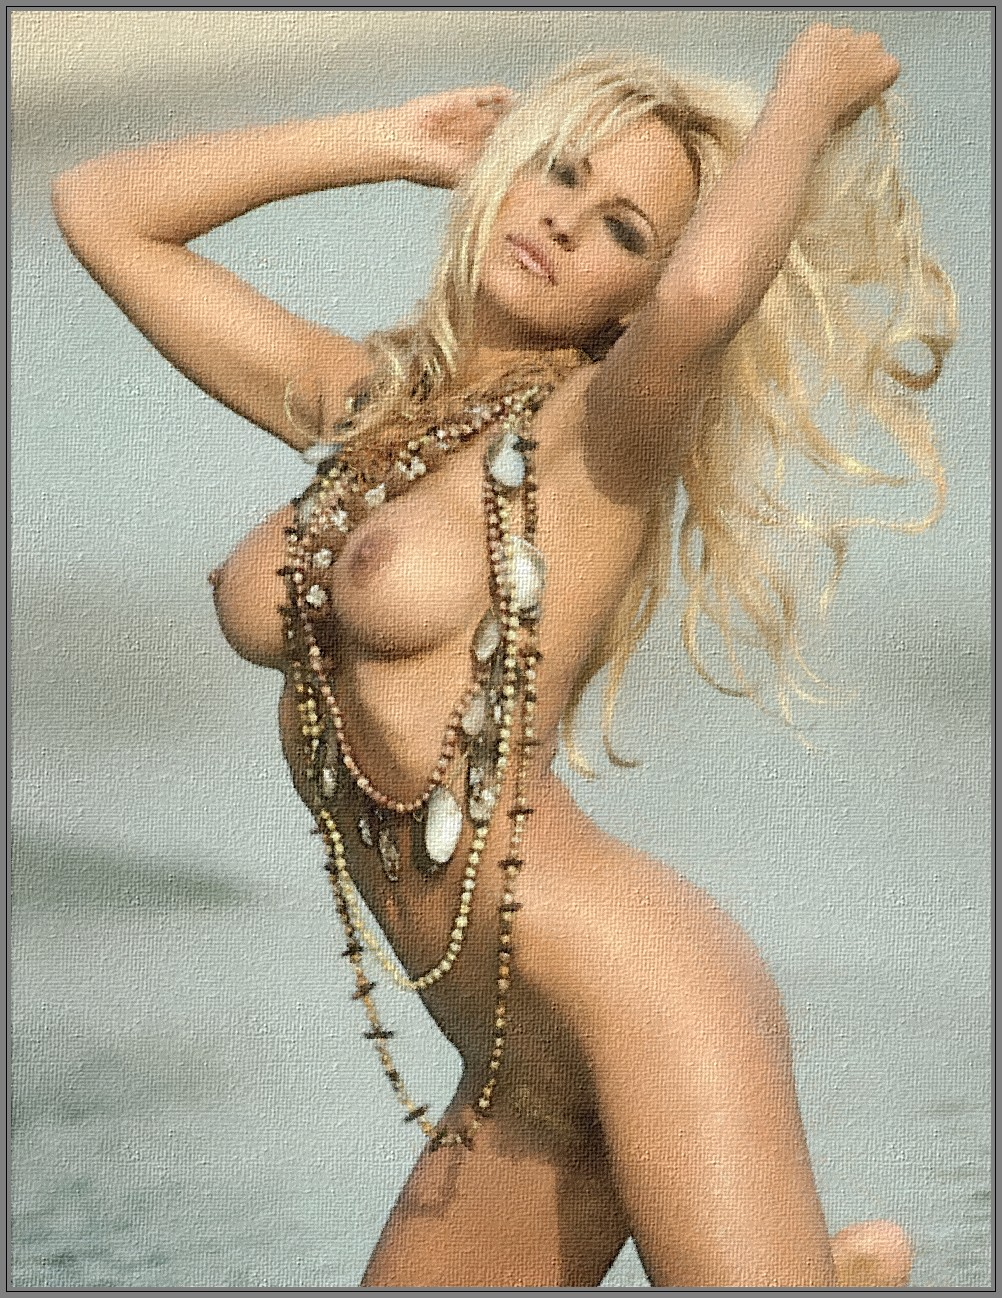 Portreti - Page 7 Foto-Sketcher-Pamela-Anderson-Nude-59-thefappeningblog-com-1